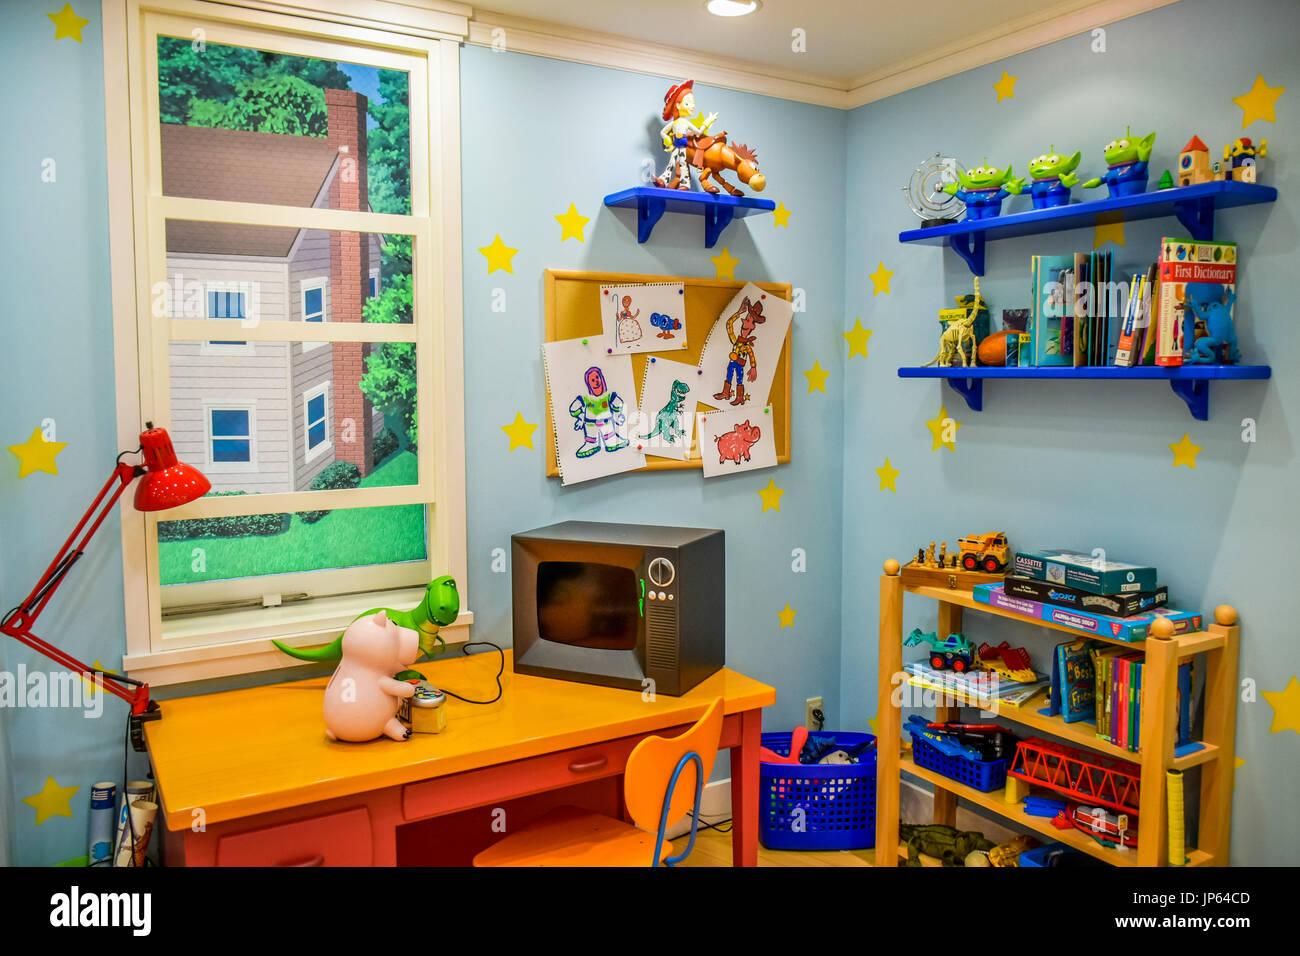 TOKYO, JAPAN - MAY 14: Toy Story room display showing in Tokyo Disneystore located at Shibuya, Tokyo - Stock Image